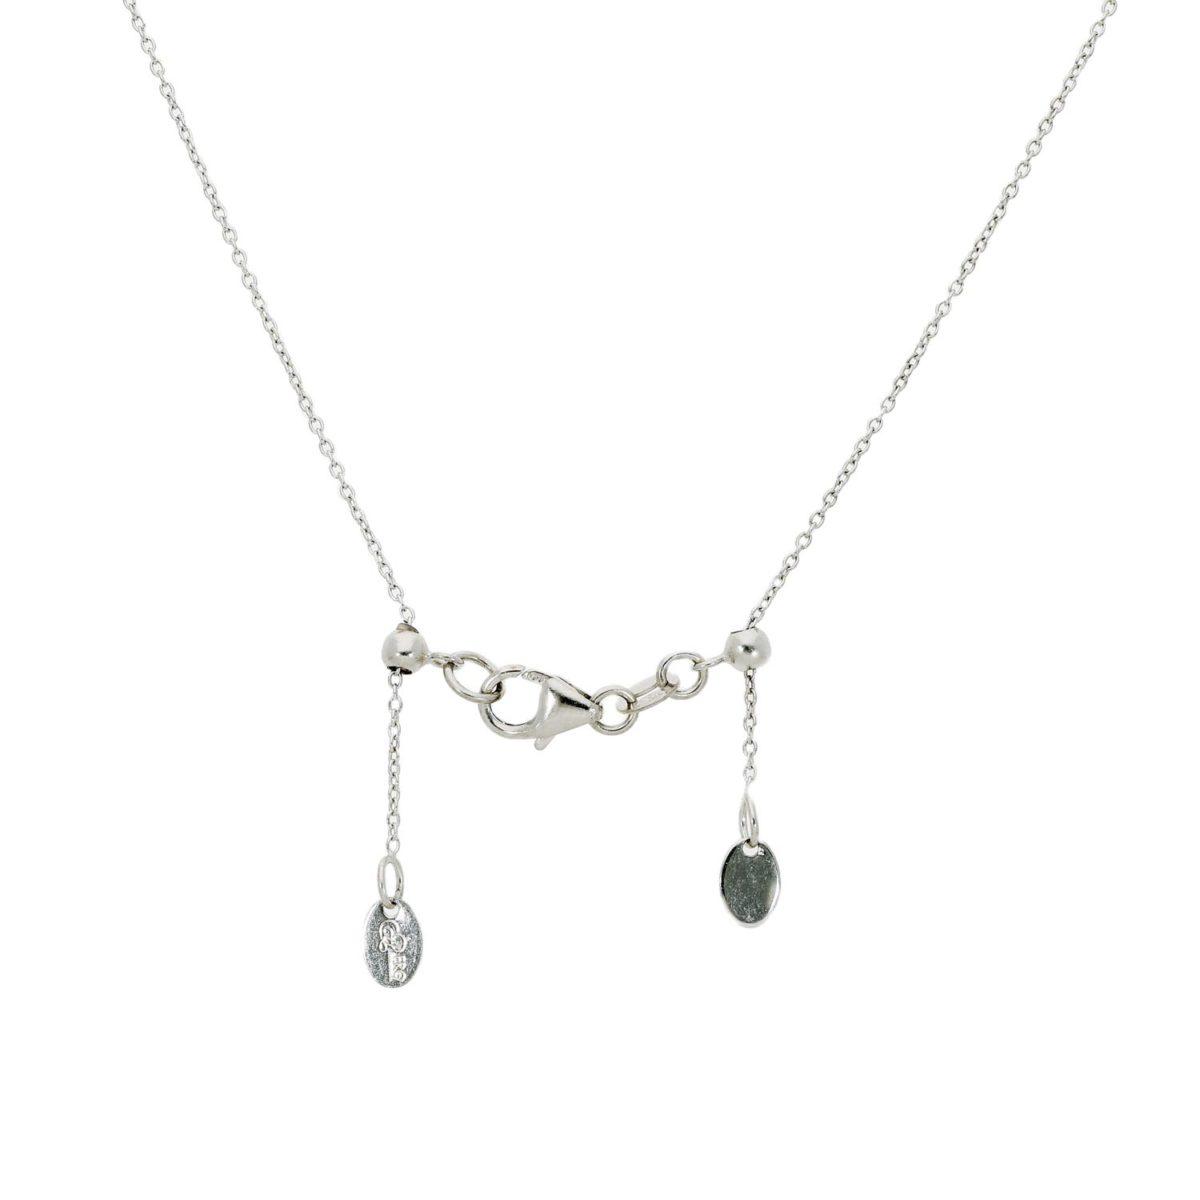 Diamond NecklaceStyle #: RIU-38470